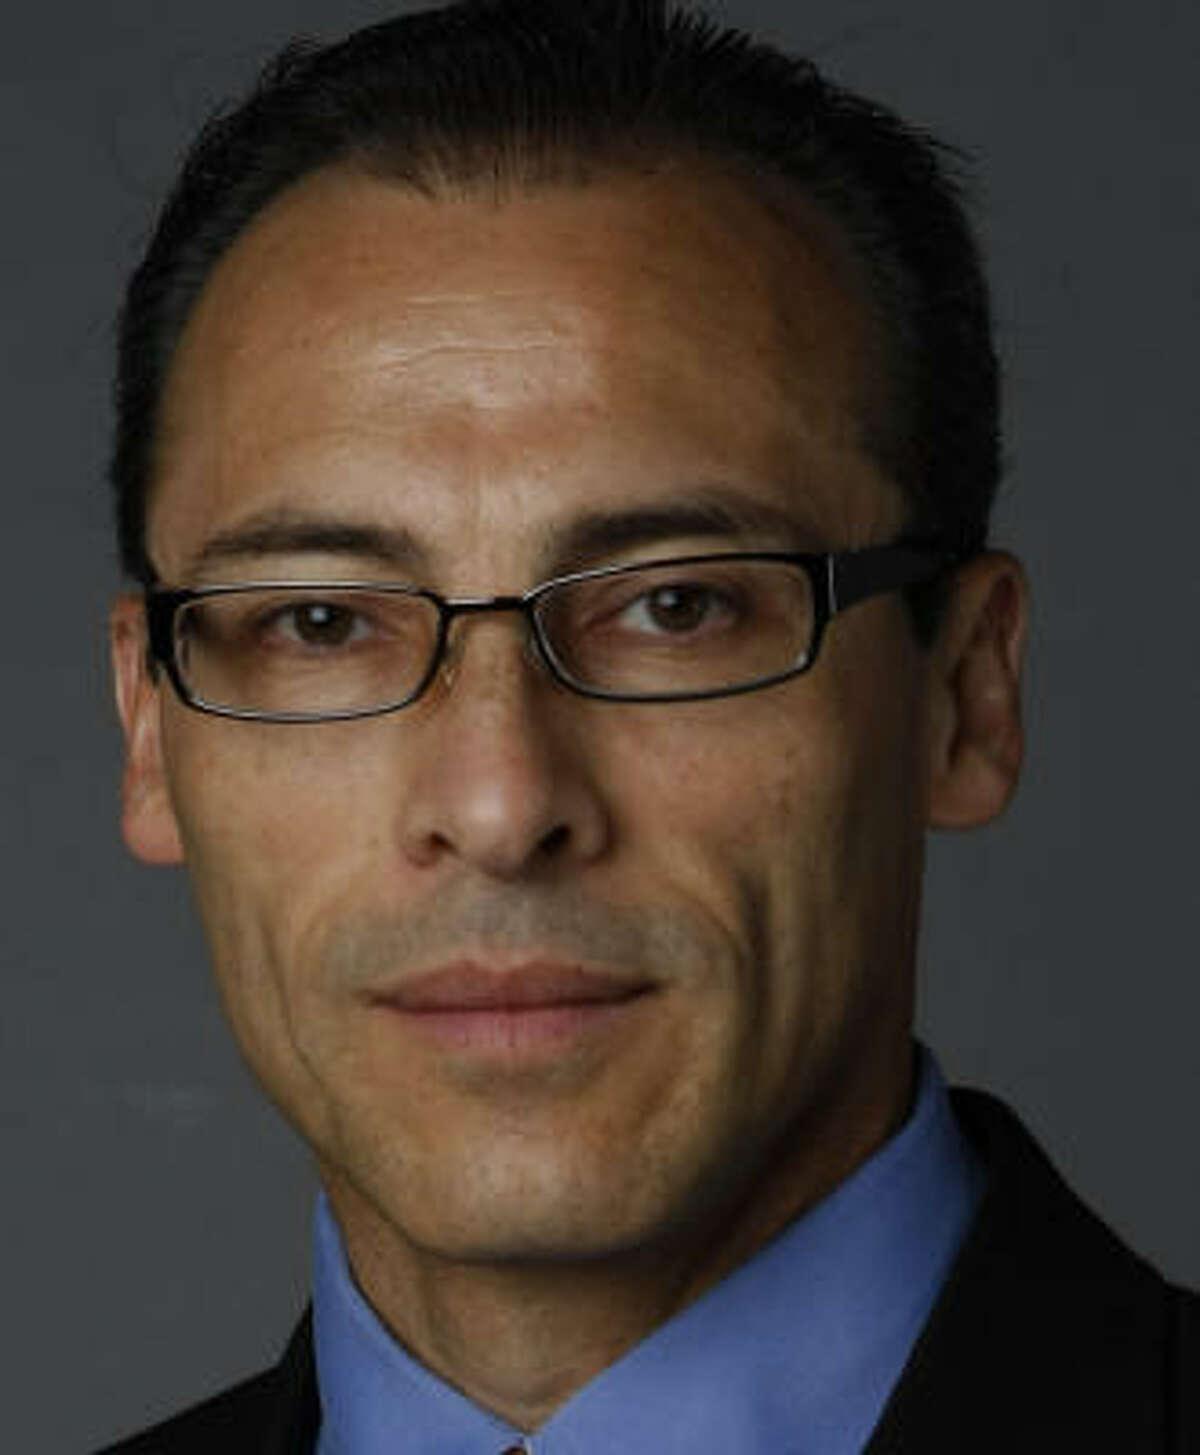 Candidate Gonzalo Camacho